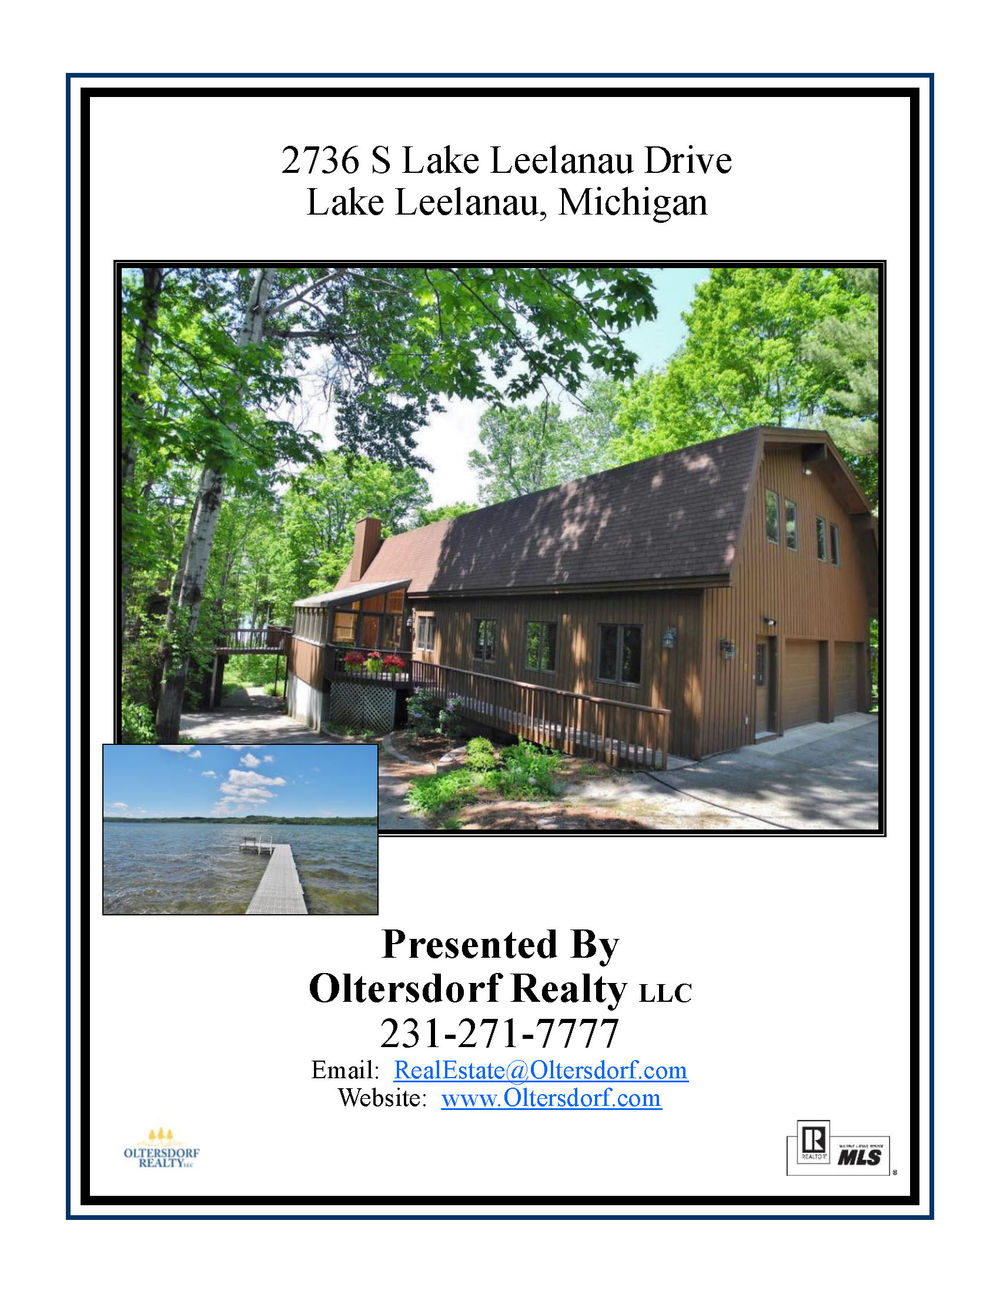 2736 S Lake Leelanau Dr, South Lake Leelanau Waterfront for sale by Oltersdorf Realty LLC - Marketing Packet (1).jpg